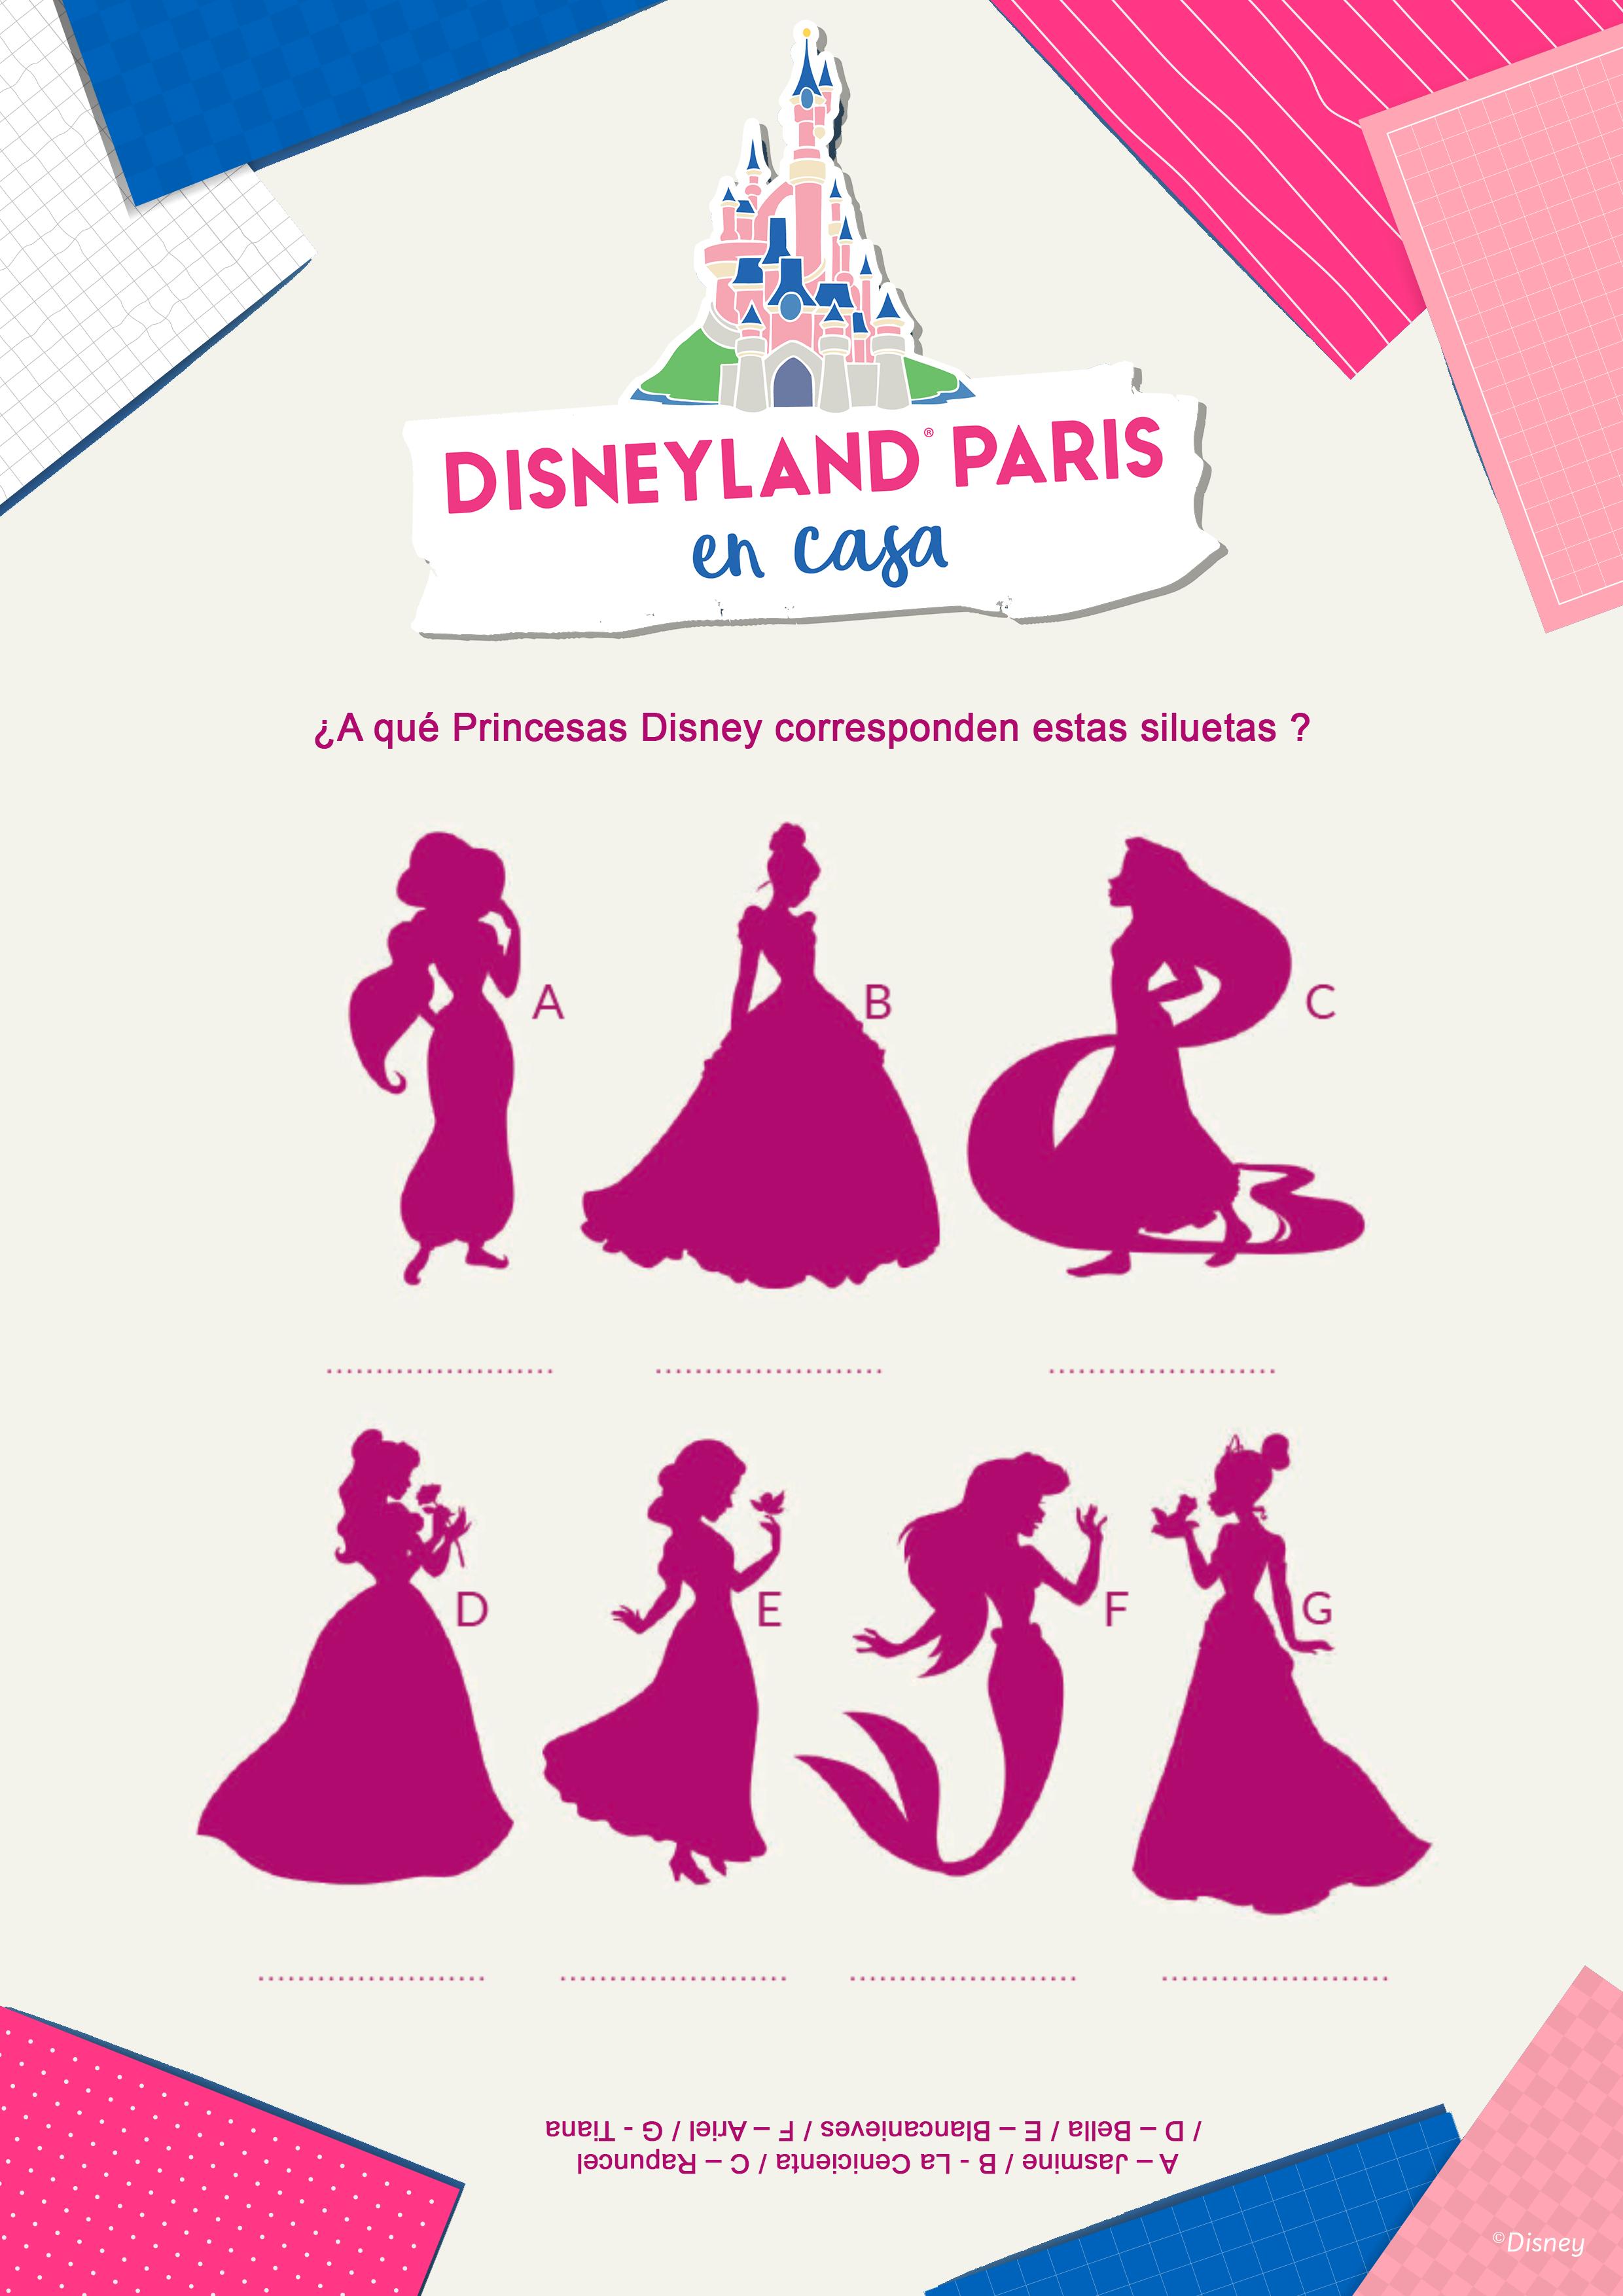 ¿A qué Princesas Disney corresponden estas siluetas ?